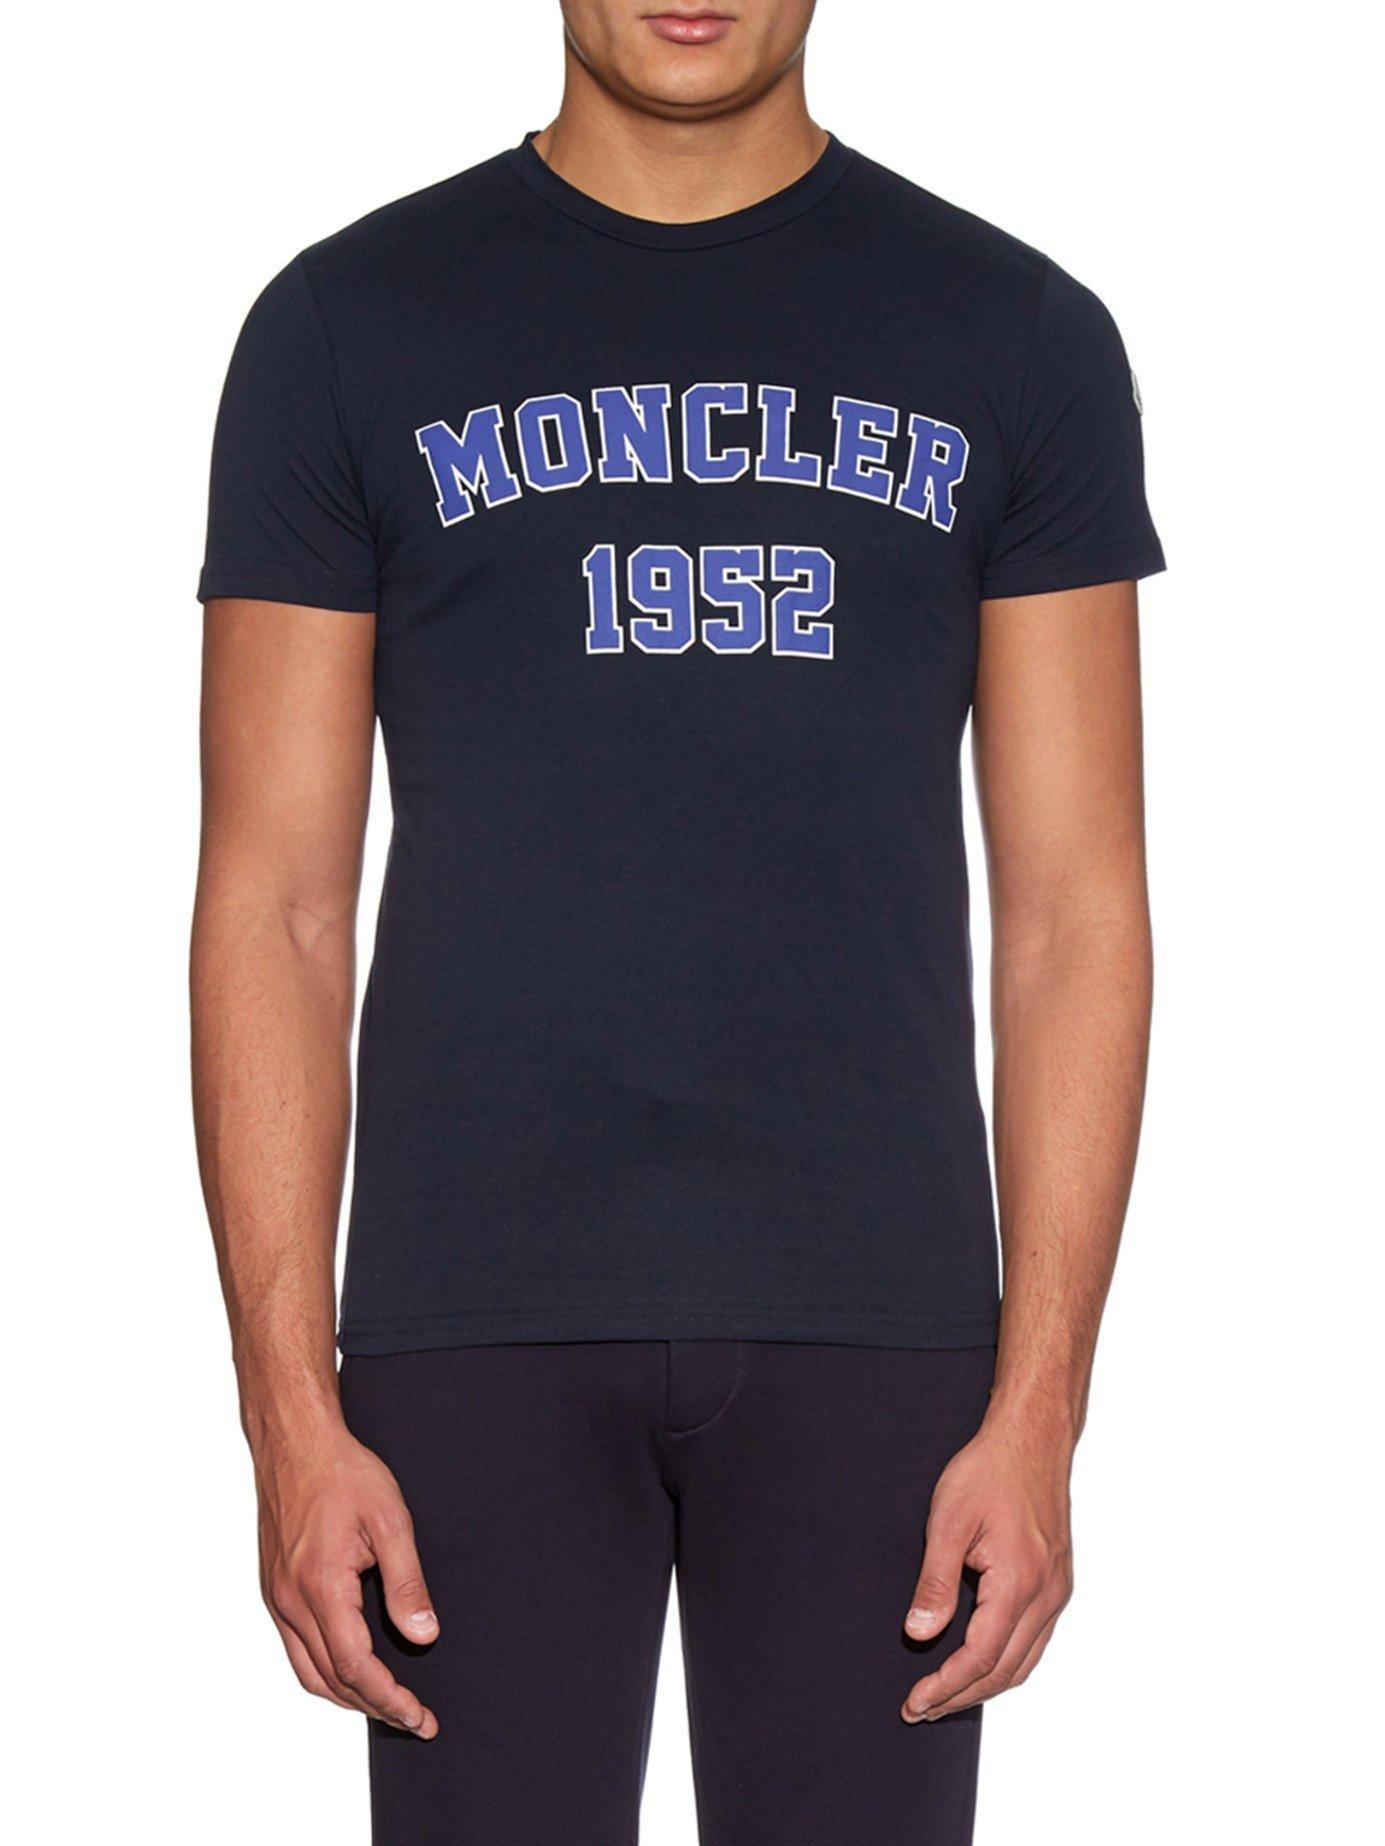 moncler 1952